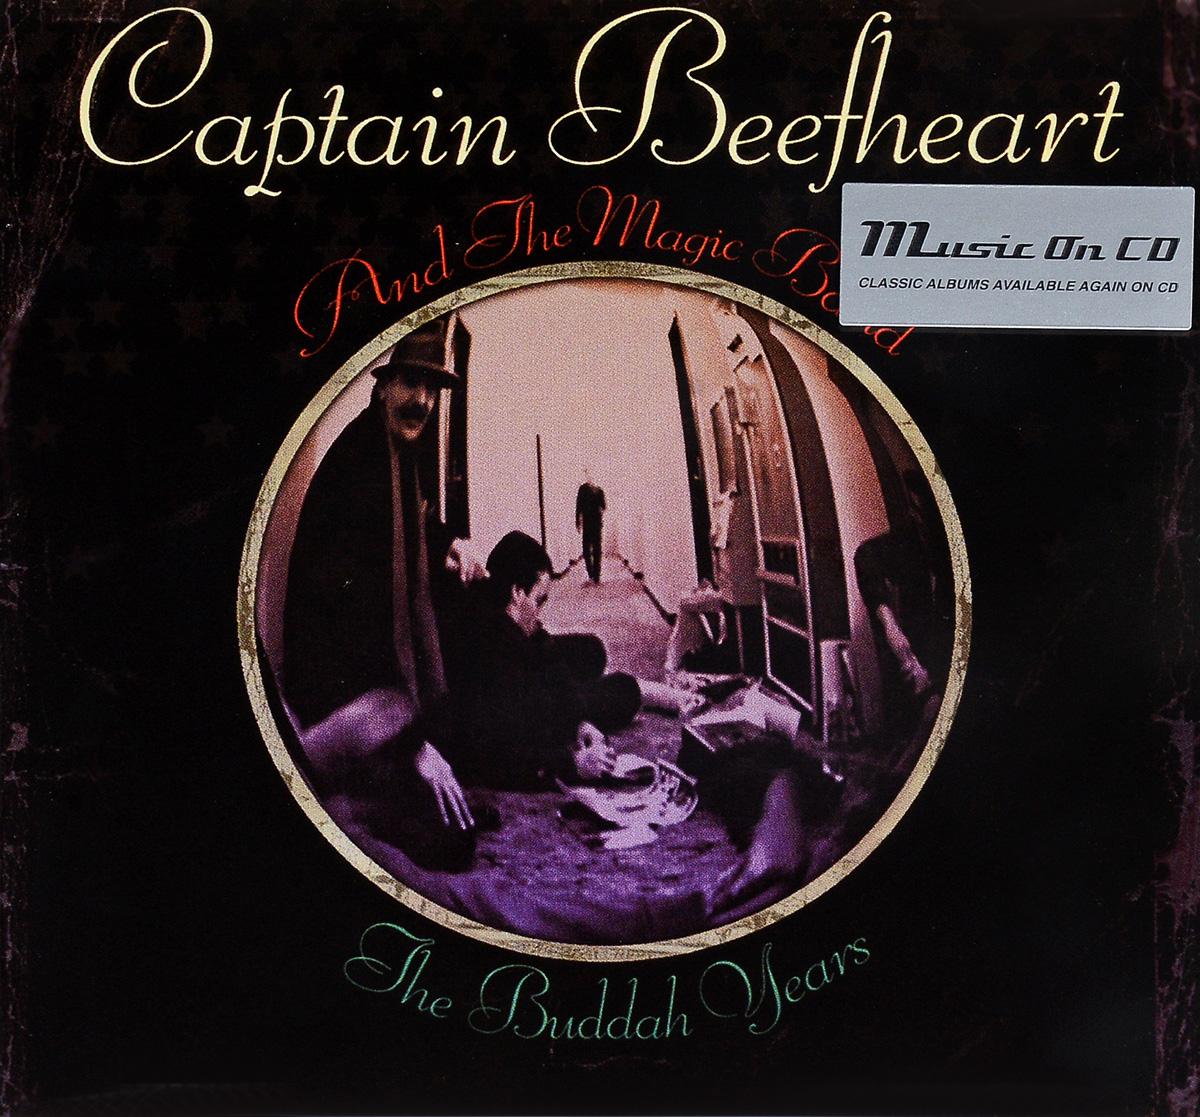 лучшая цена Кэптен Бифхарт Captain Beefheart. Buddah Years